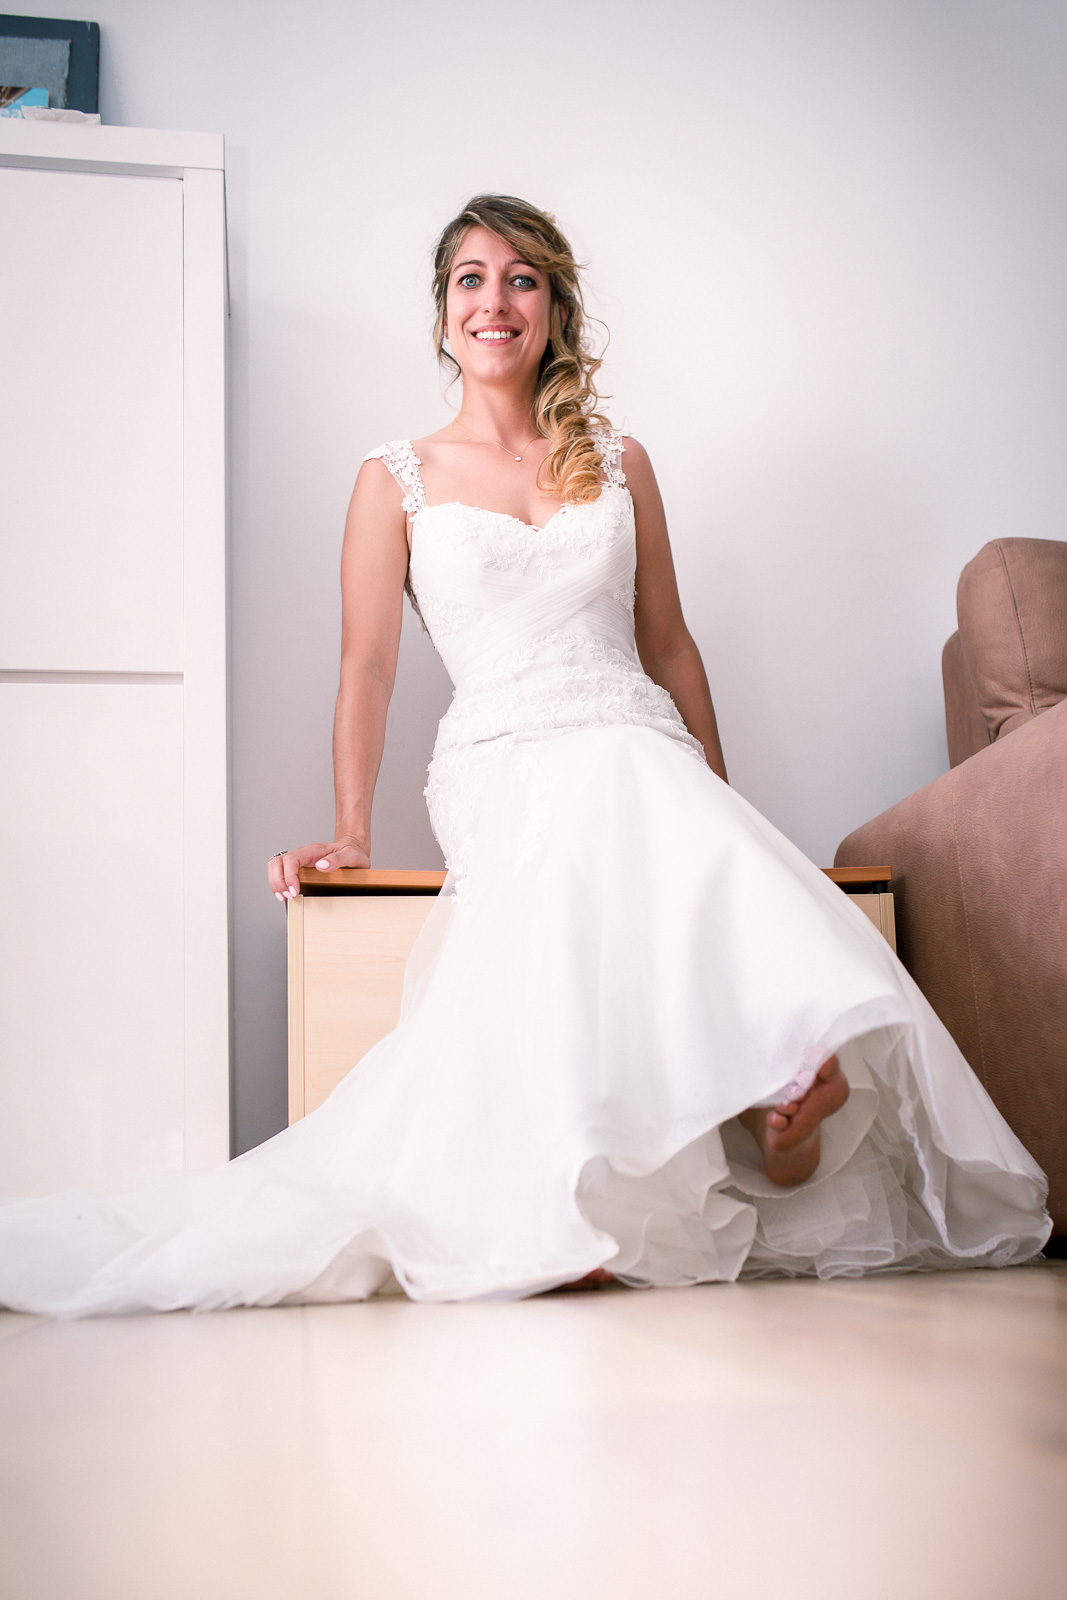 photographe mariage portrait marignane bouches-du-rhône digitregards